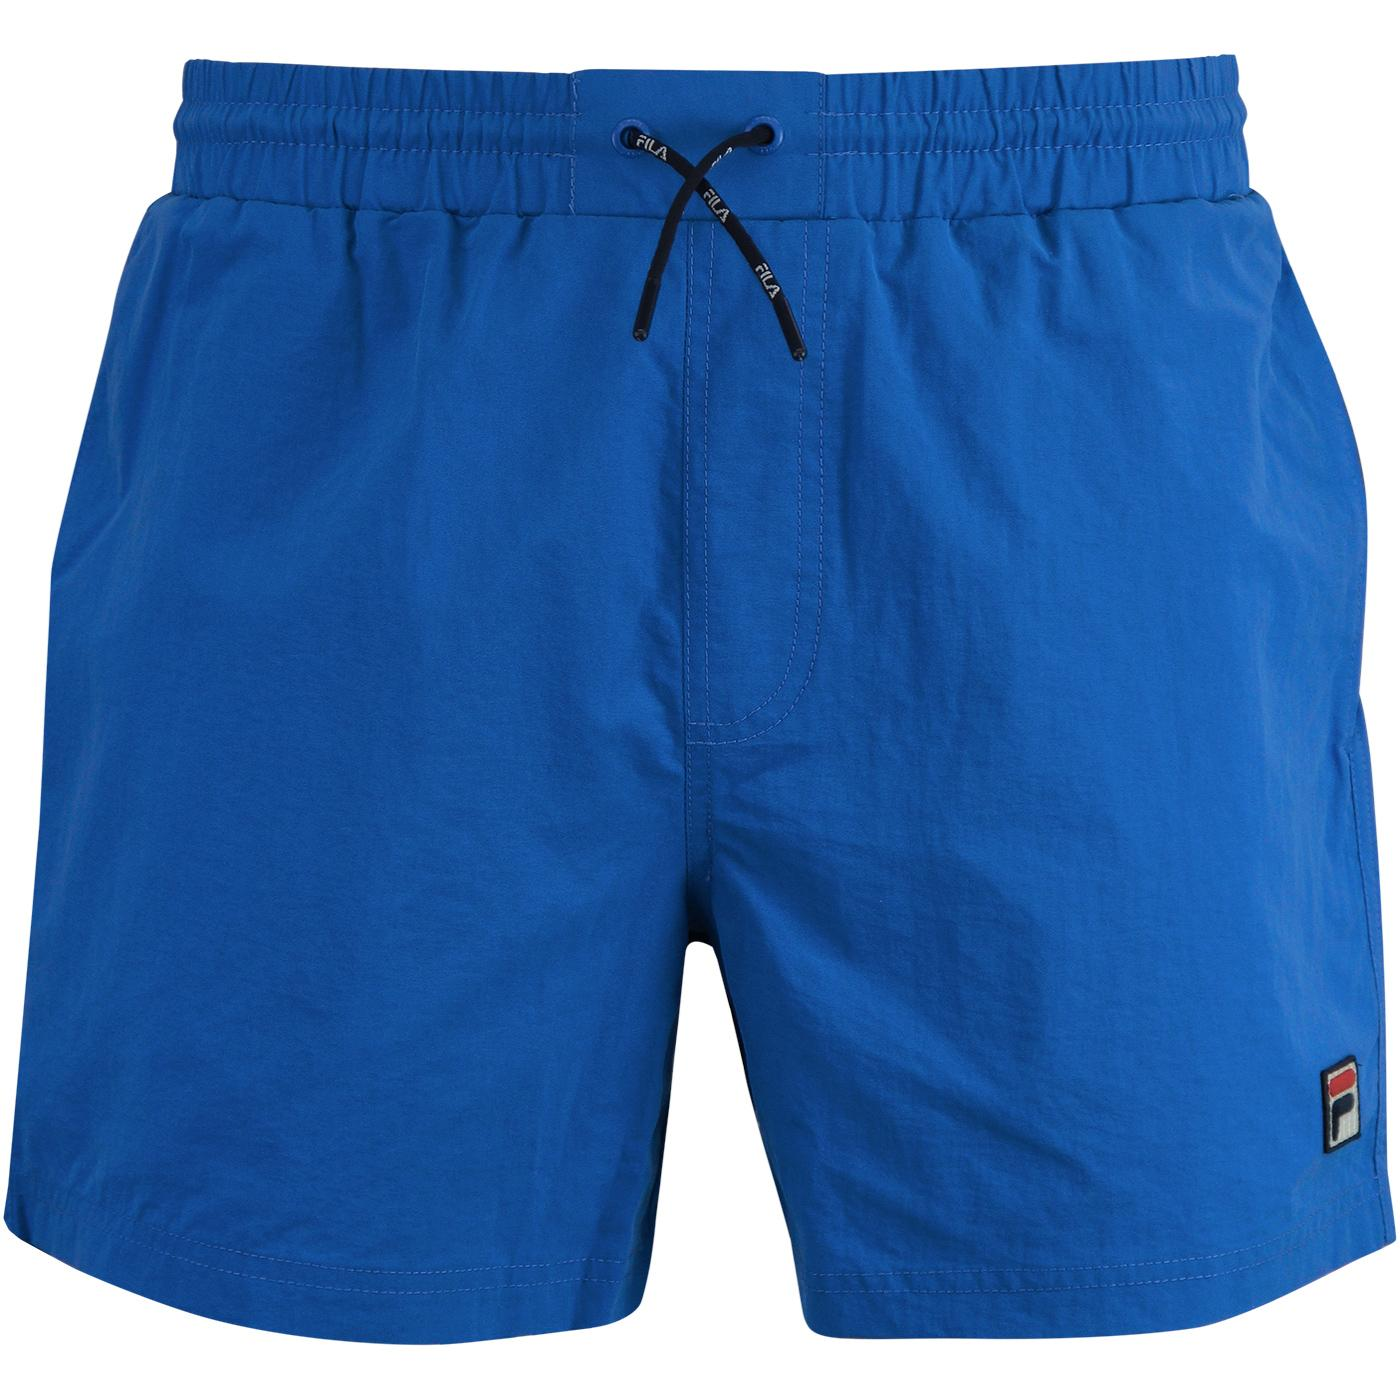 Martin FILA VINTAGE Retro 80s Basic Swim Shorts DB